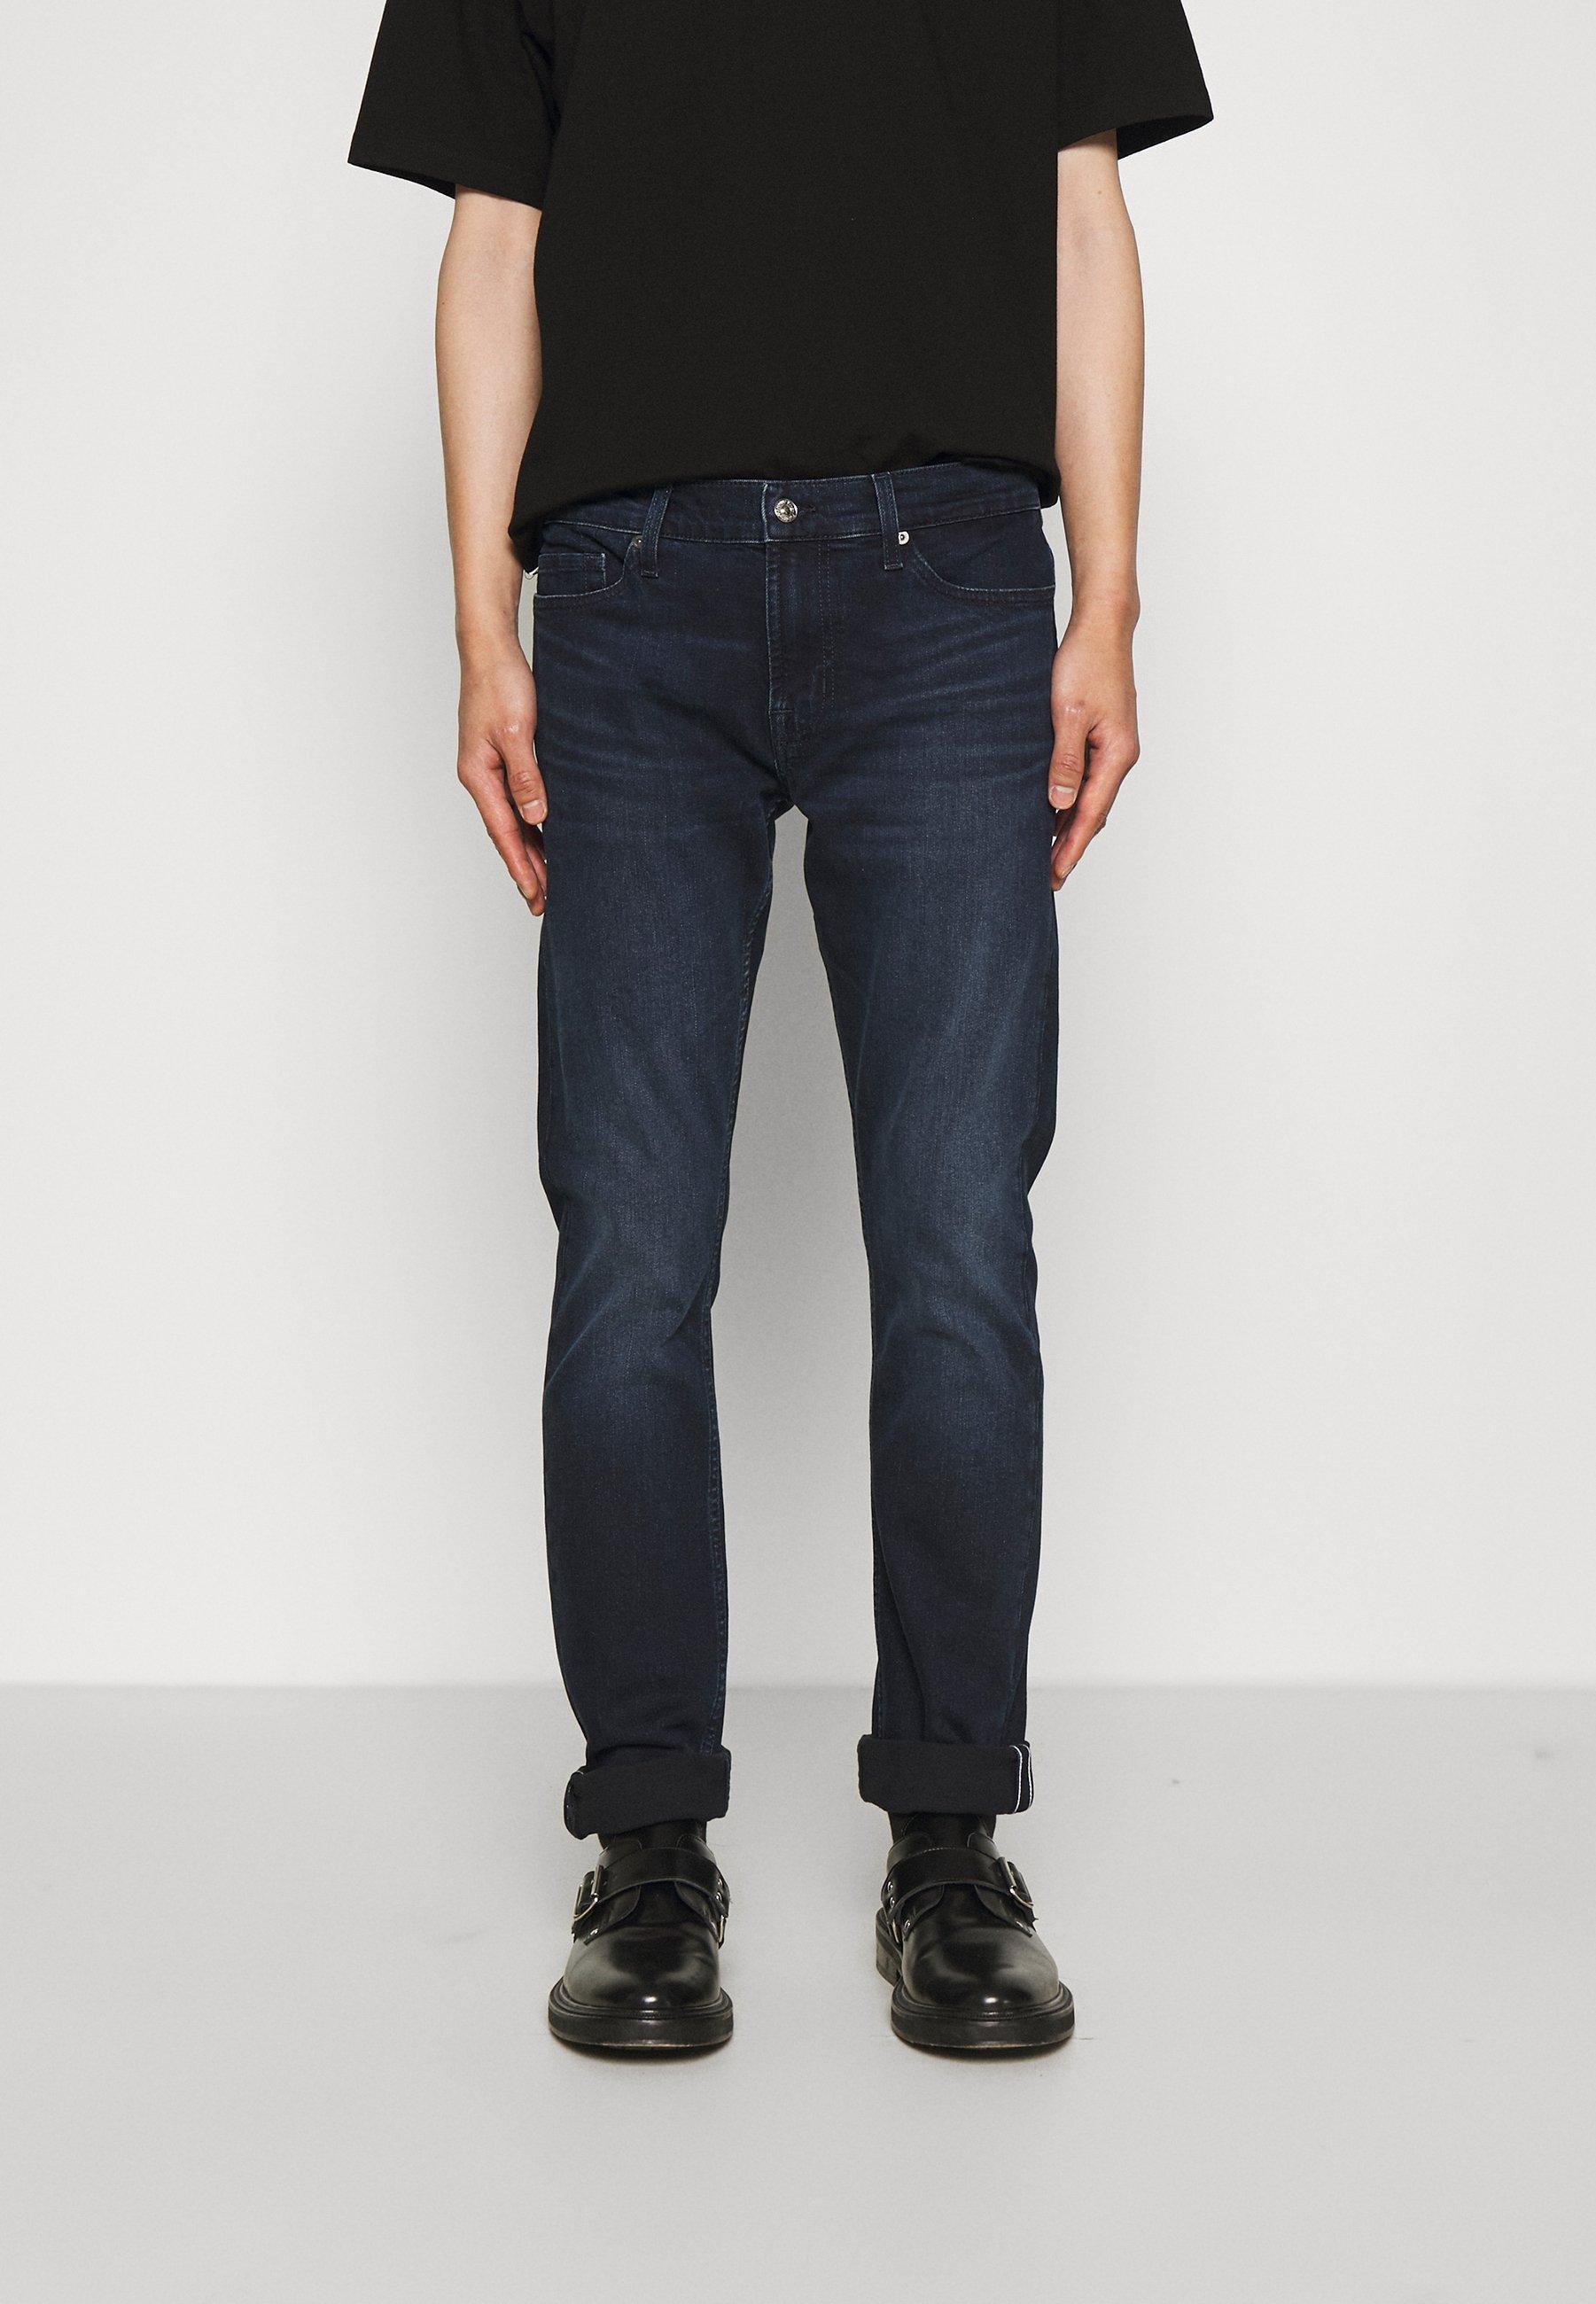 Uomo RONNIE - Jeans slim fit